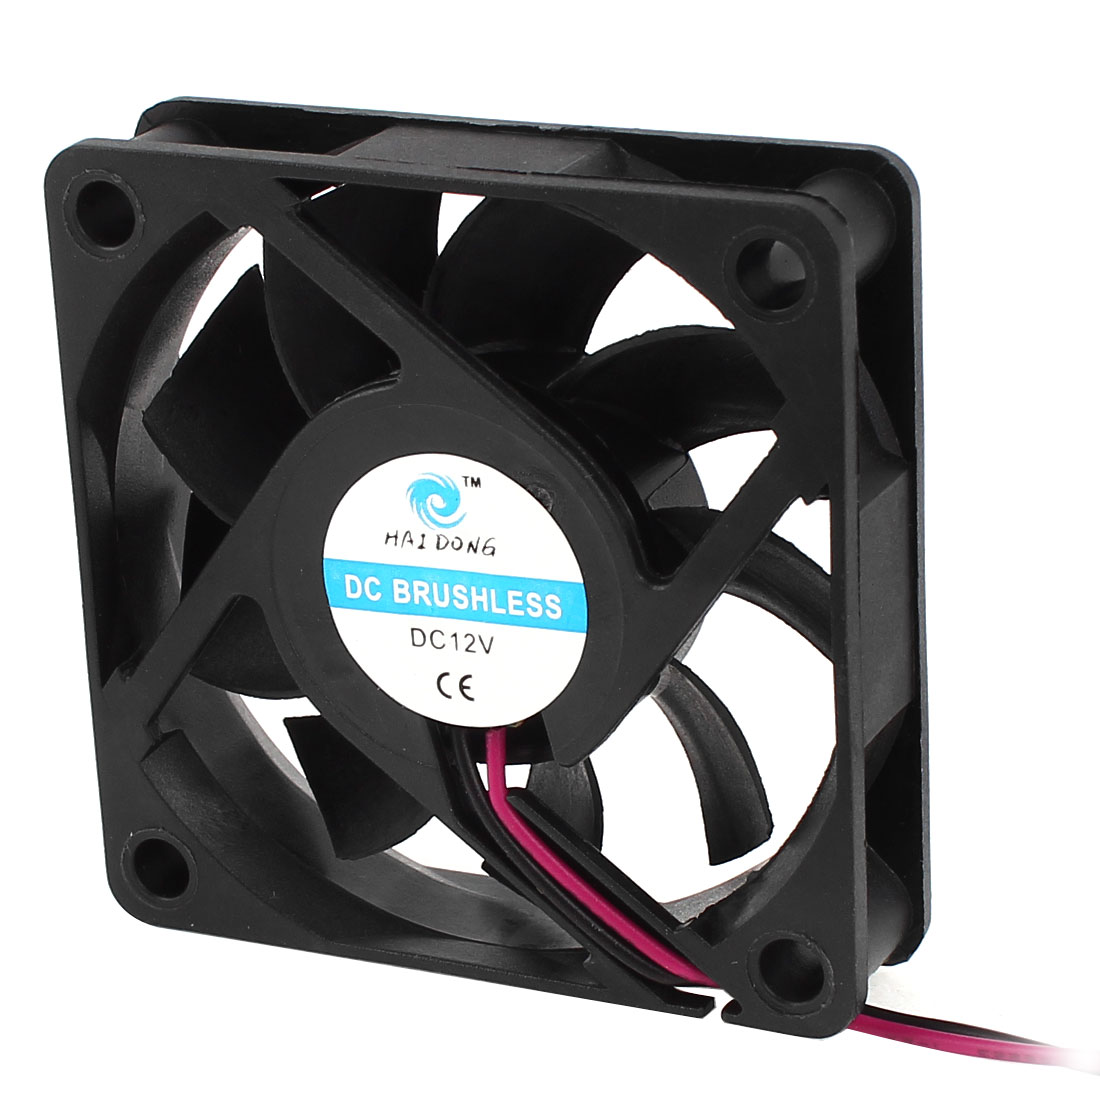 60mm x 15mm 6015 Brushless Cooling Fan DC 12V for Computer Case CPU Cooler